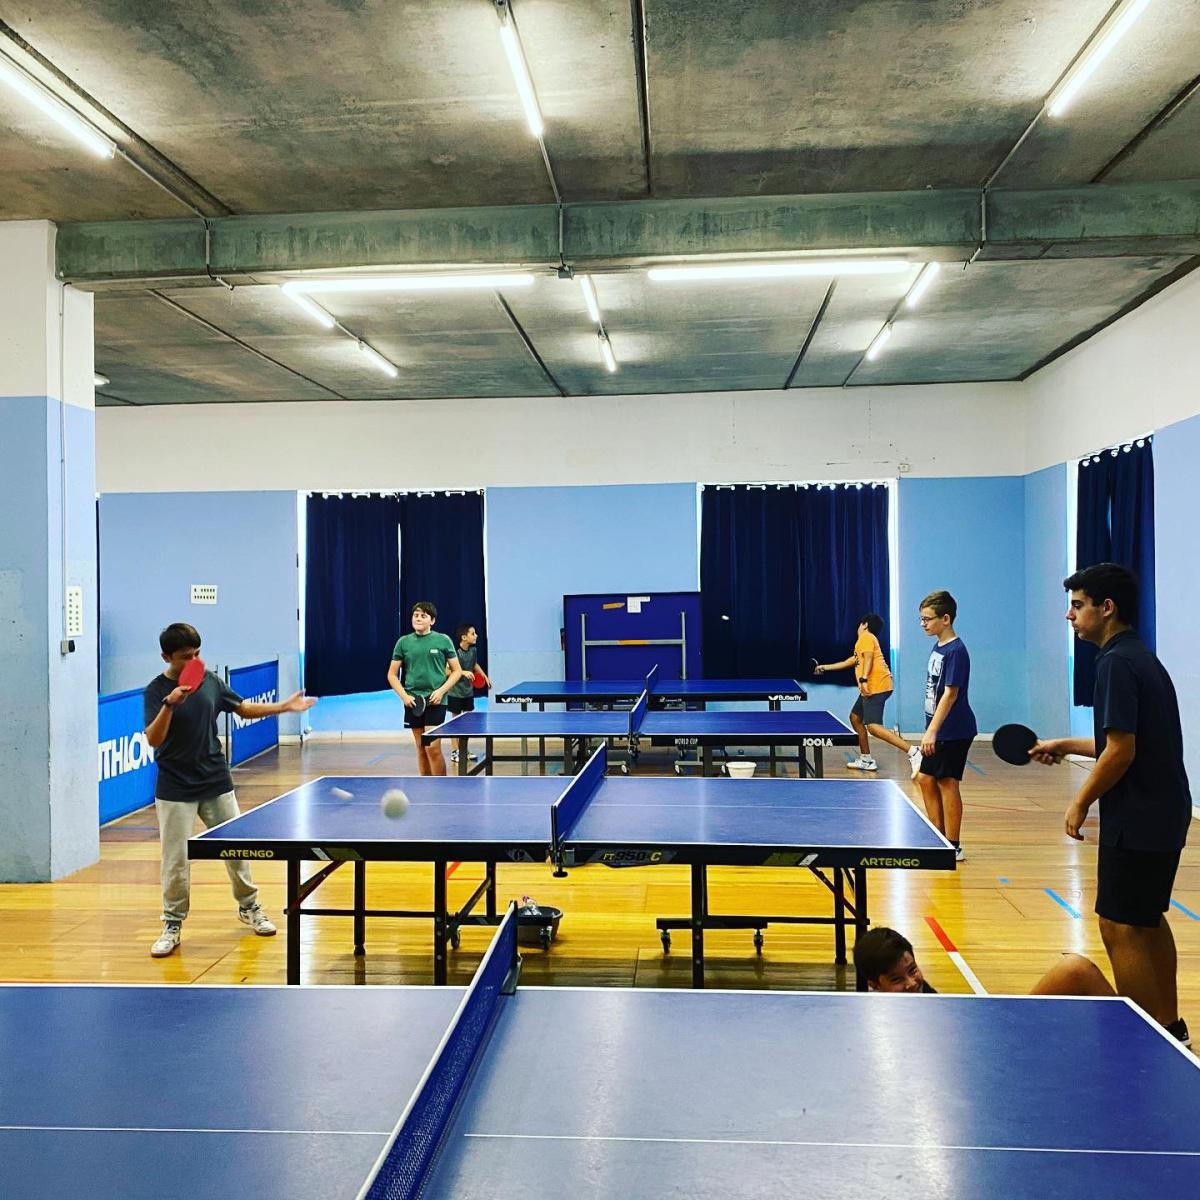 stage sportif pingpong forfait semaine du 19/07 au 23/07/21